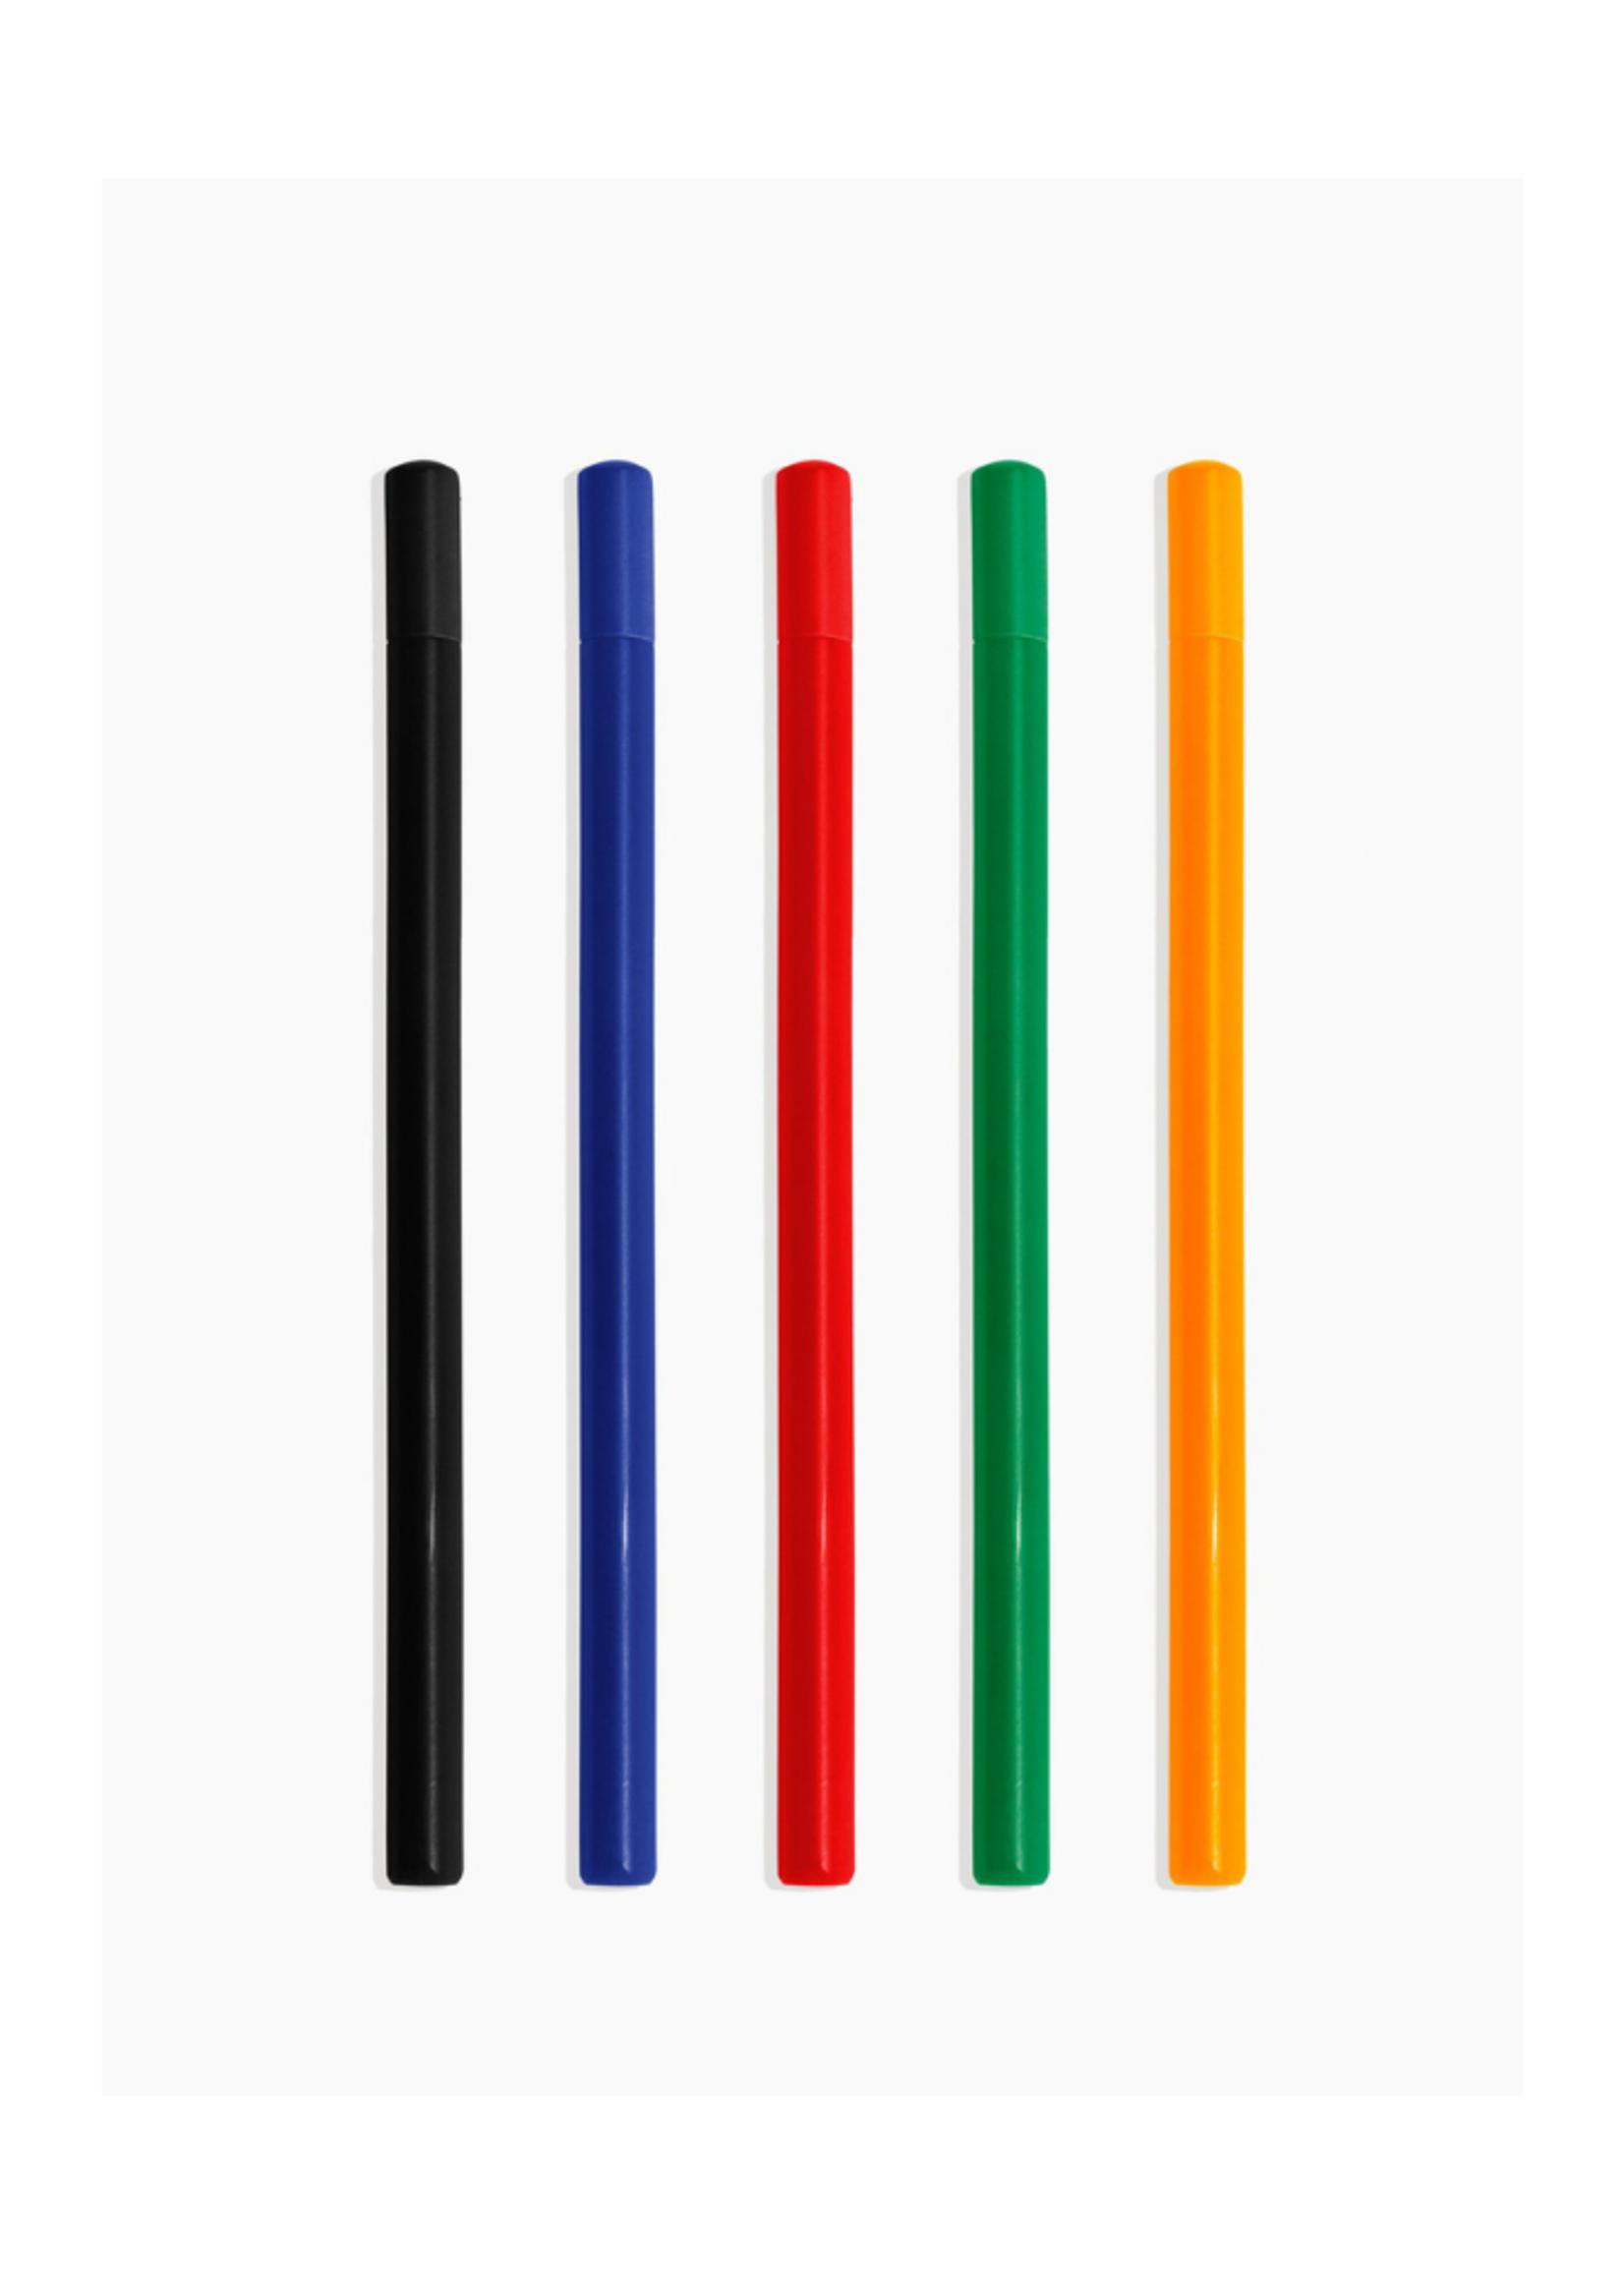 Poketo Prism Roller Pens - 5 Pack